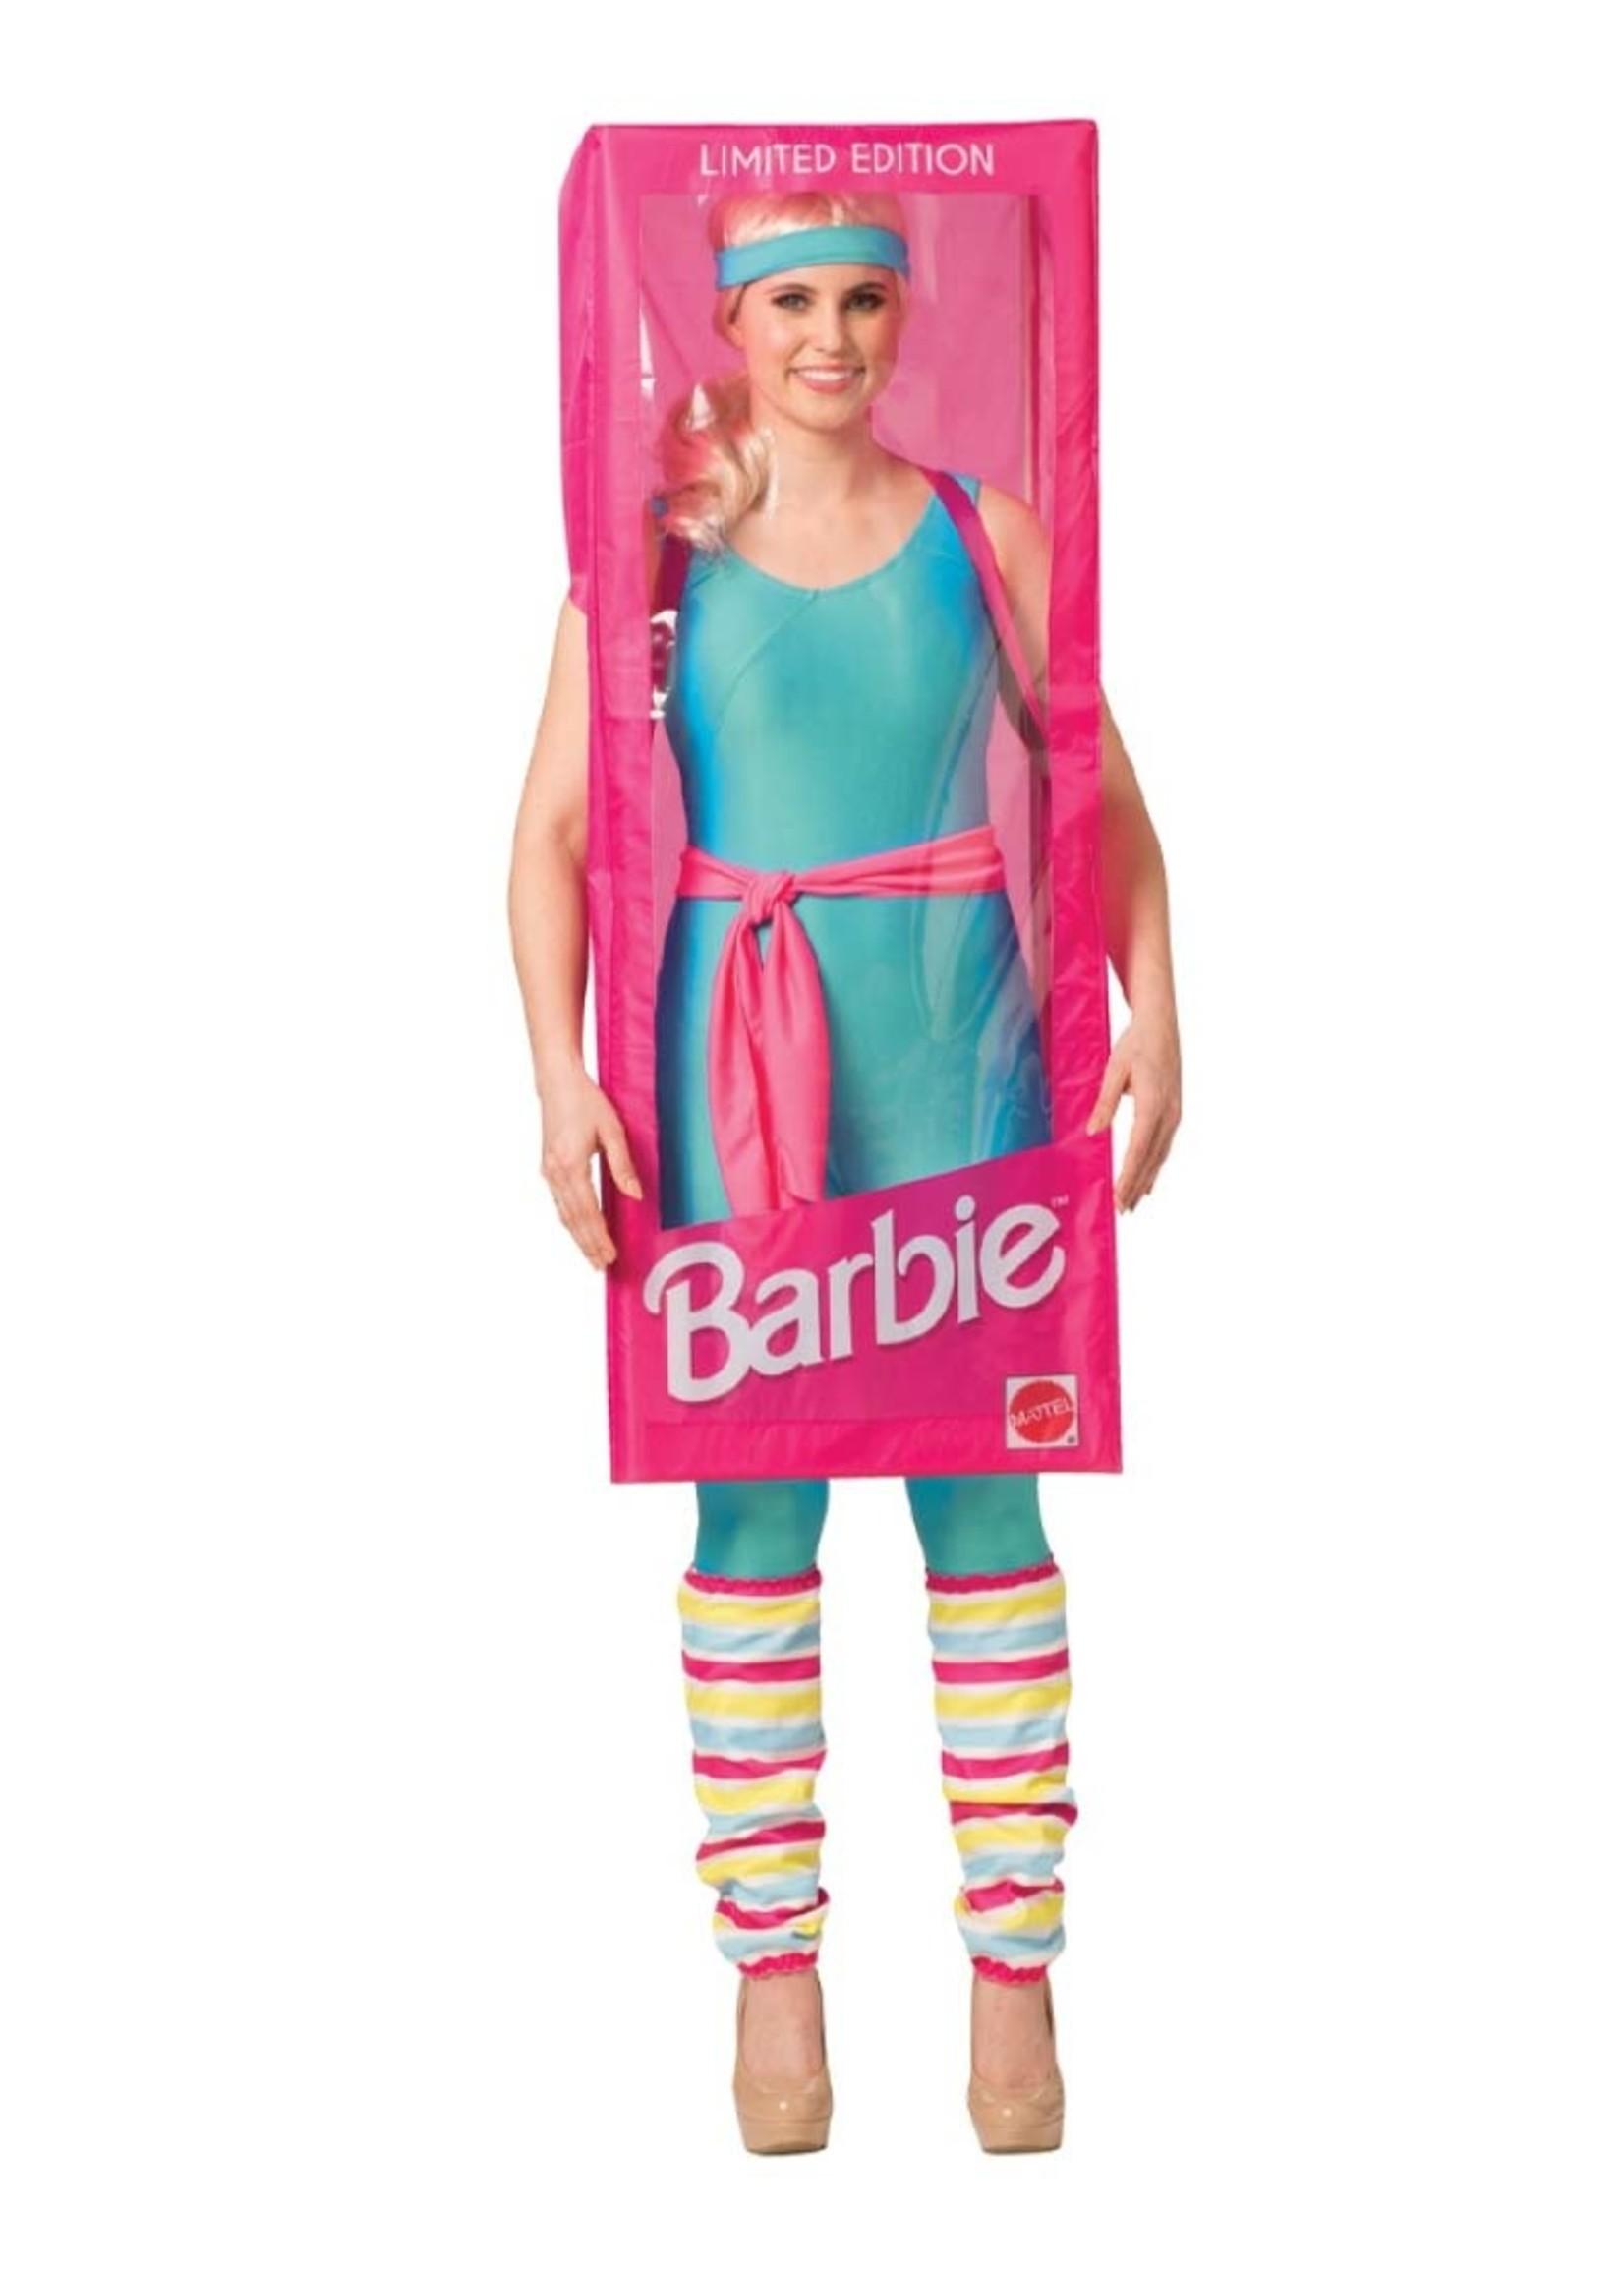 RASTA IMPOSTA PRODUCTS Barbie Doll Box - Humor